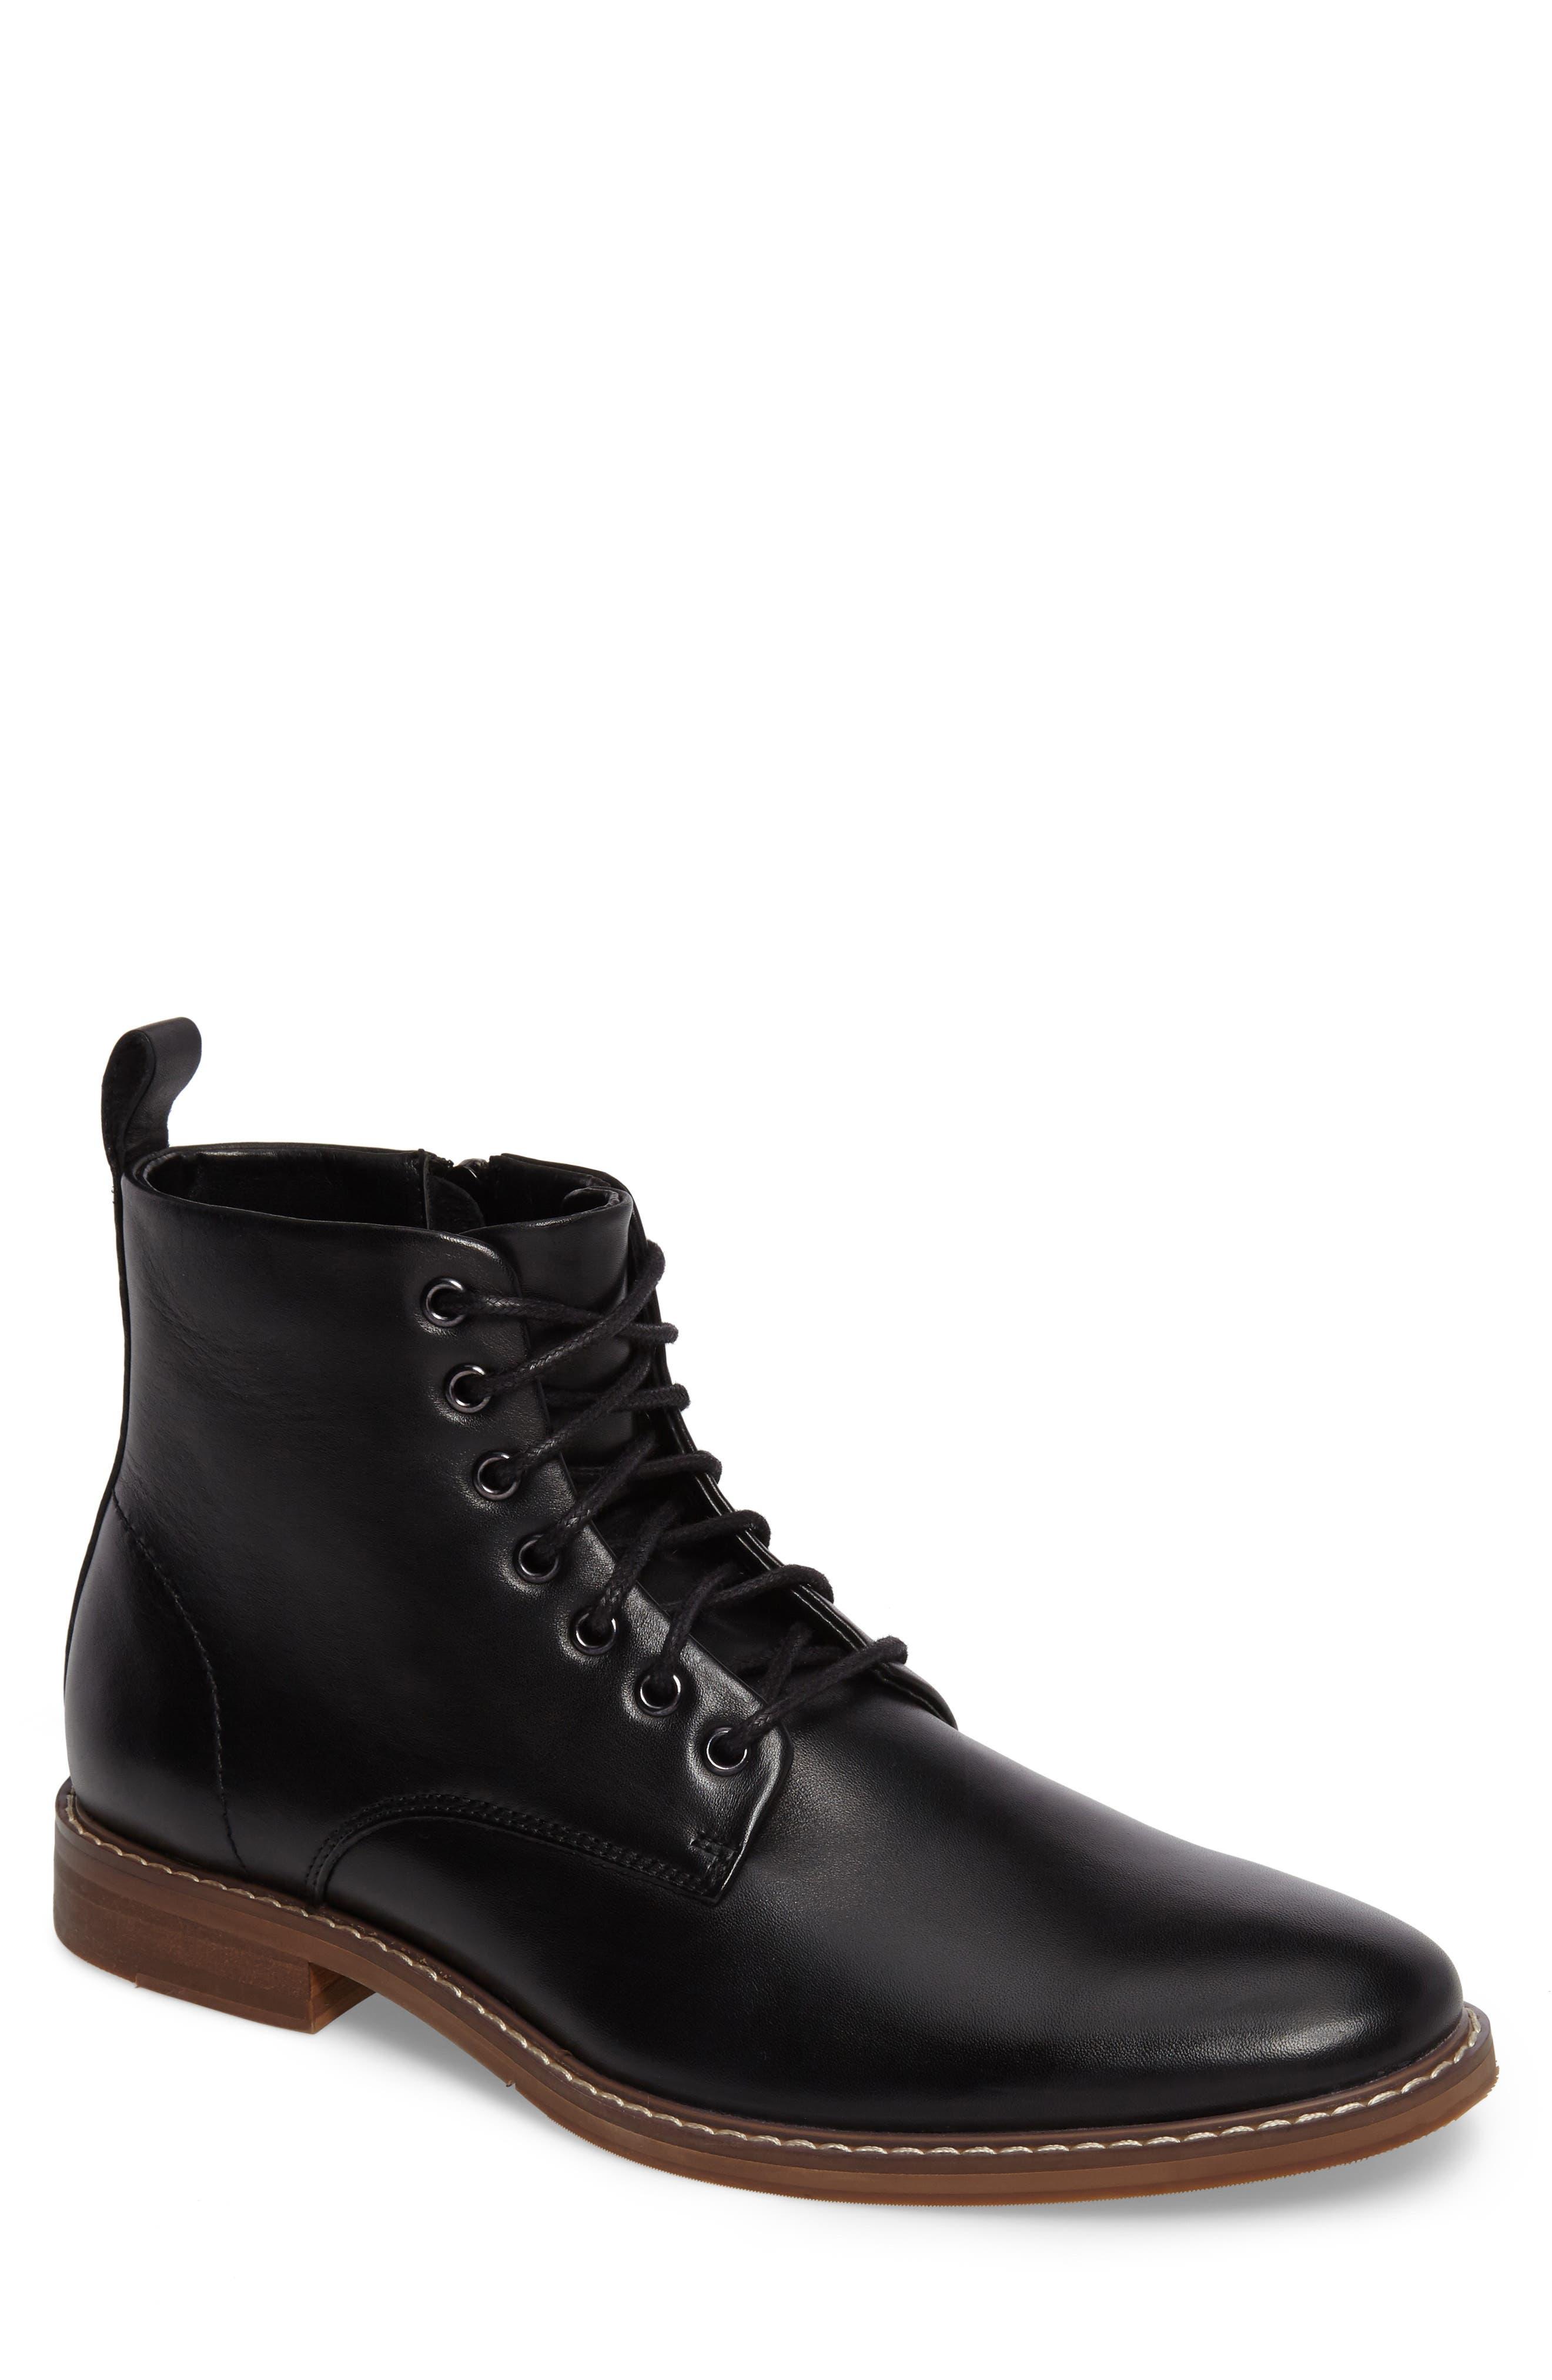 Albany Plain Toe Boot,                         Main,                         color, Black Leather